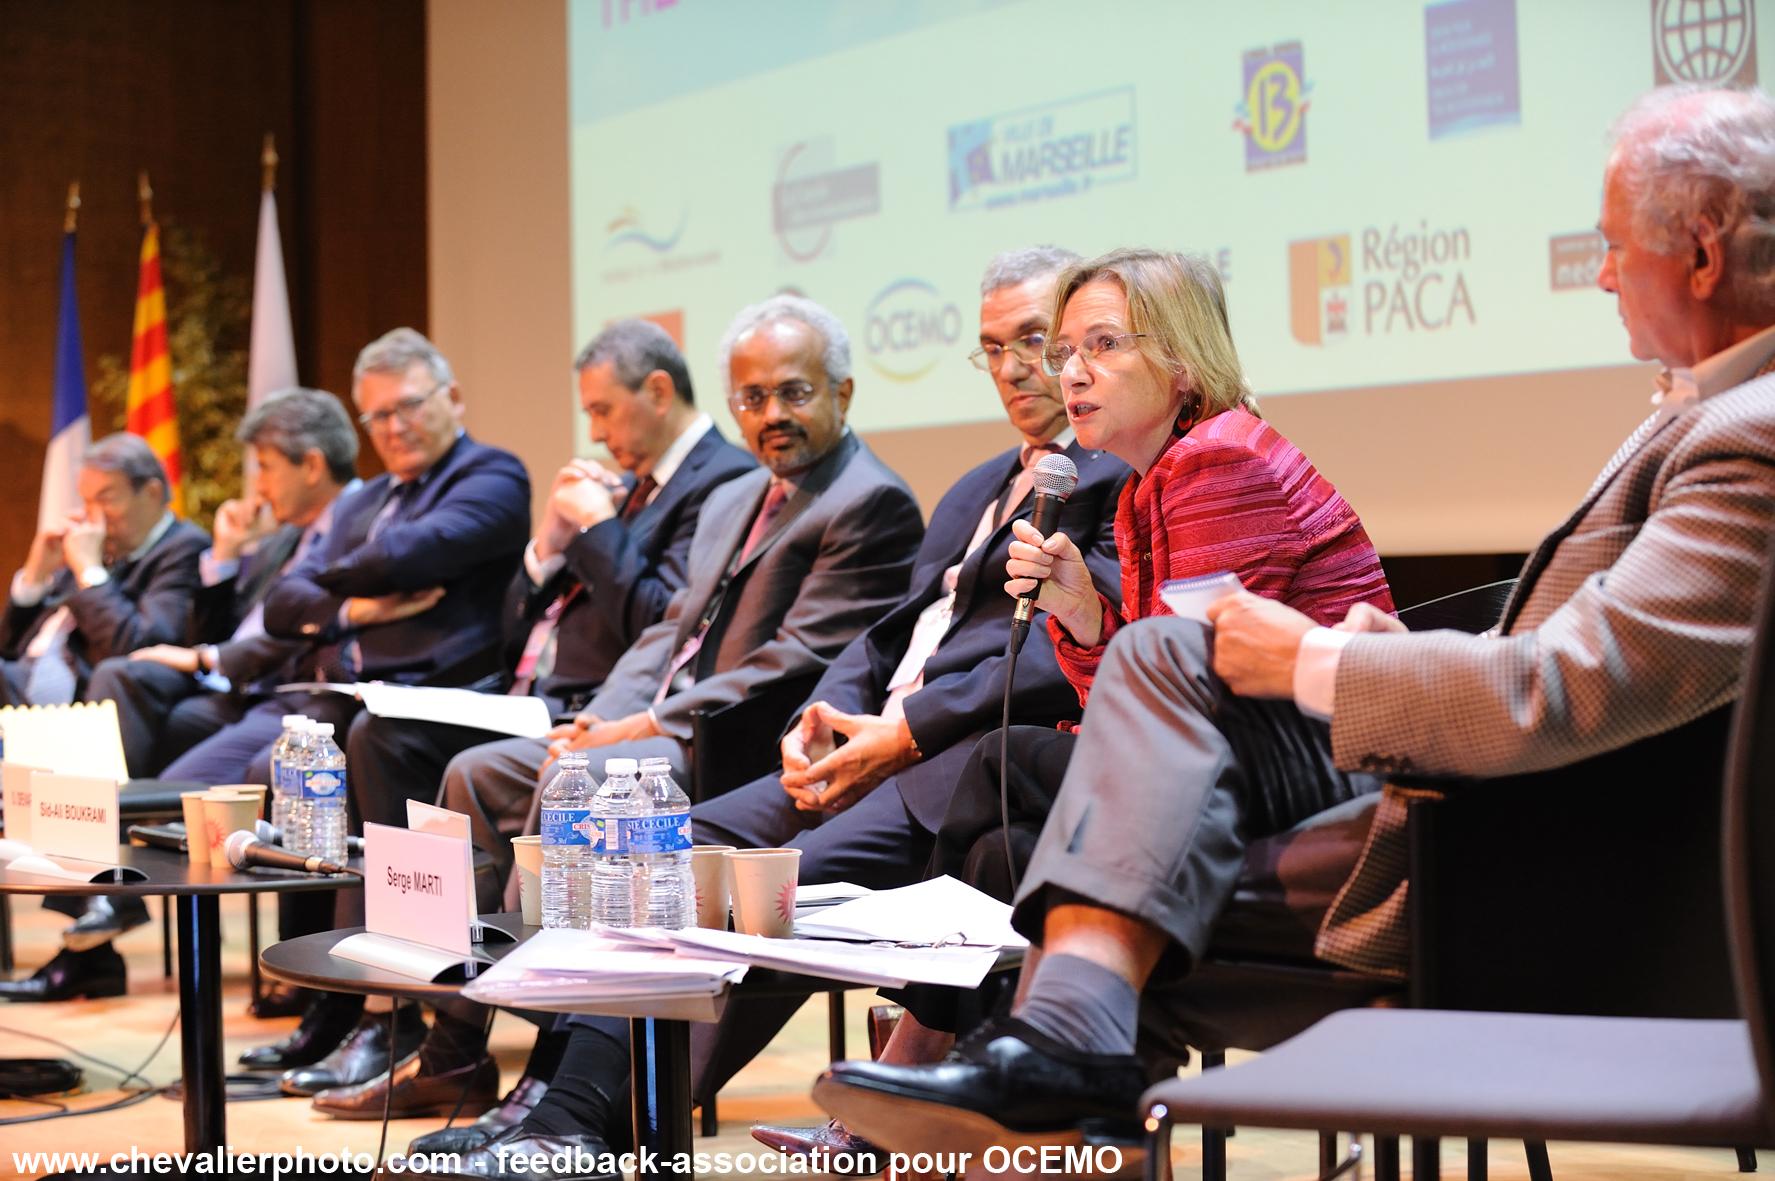 Blois rencontres histoire 2017